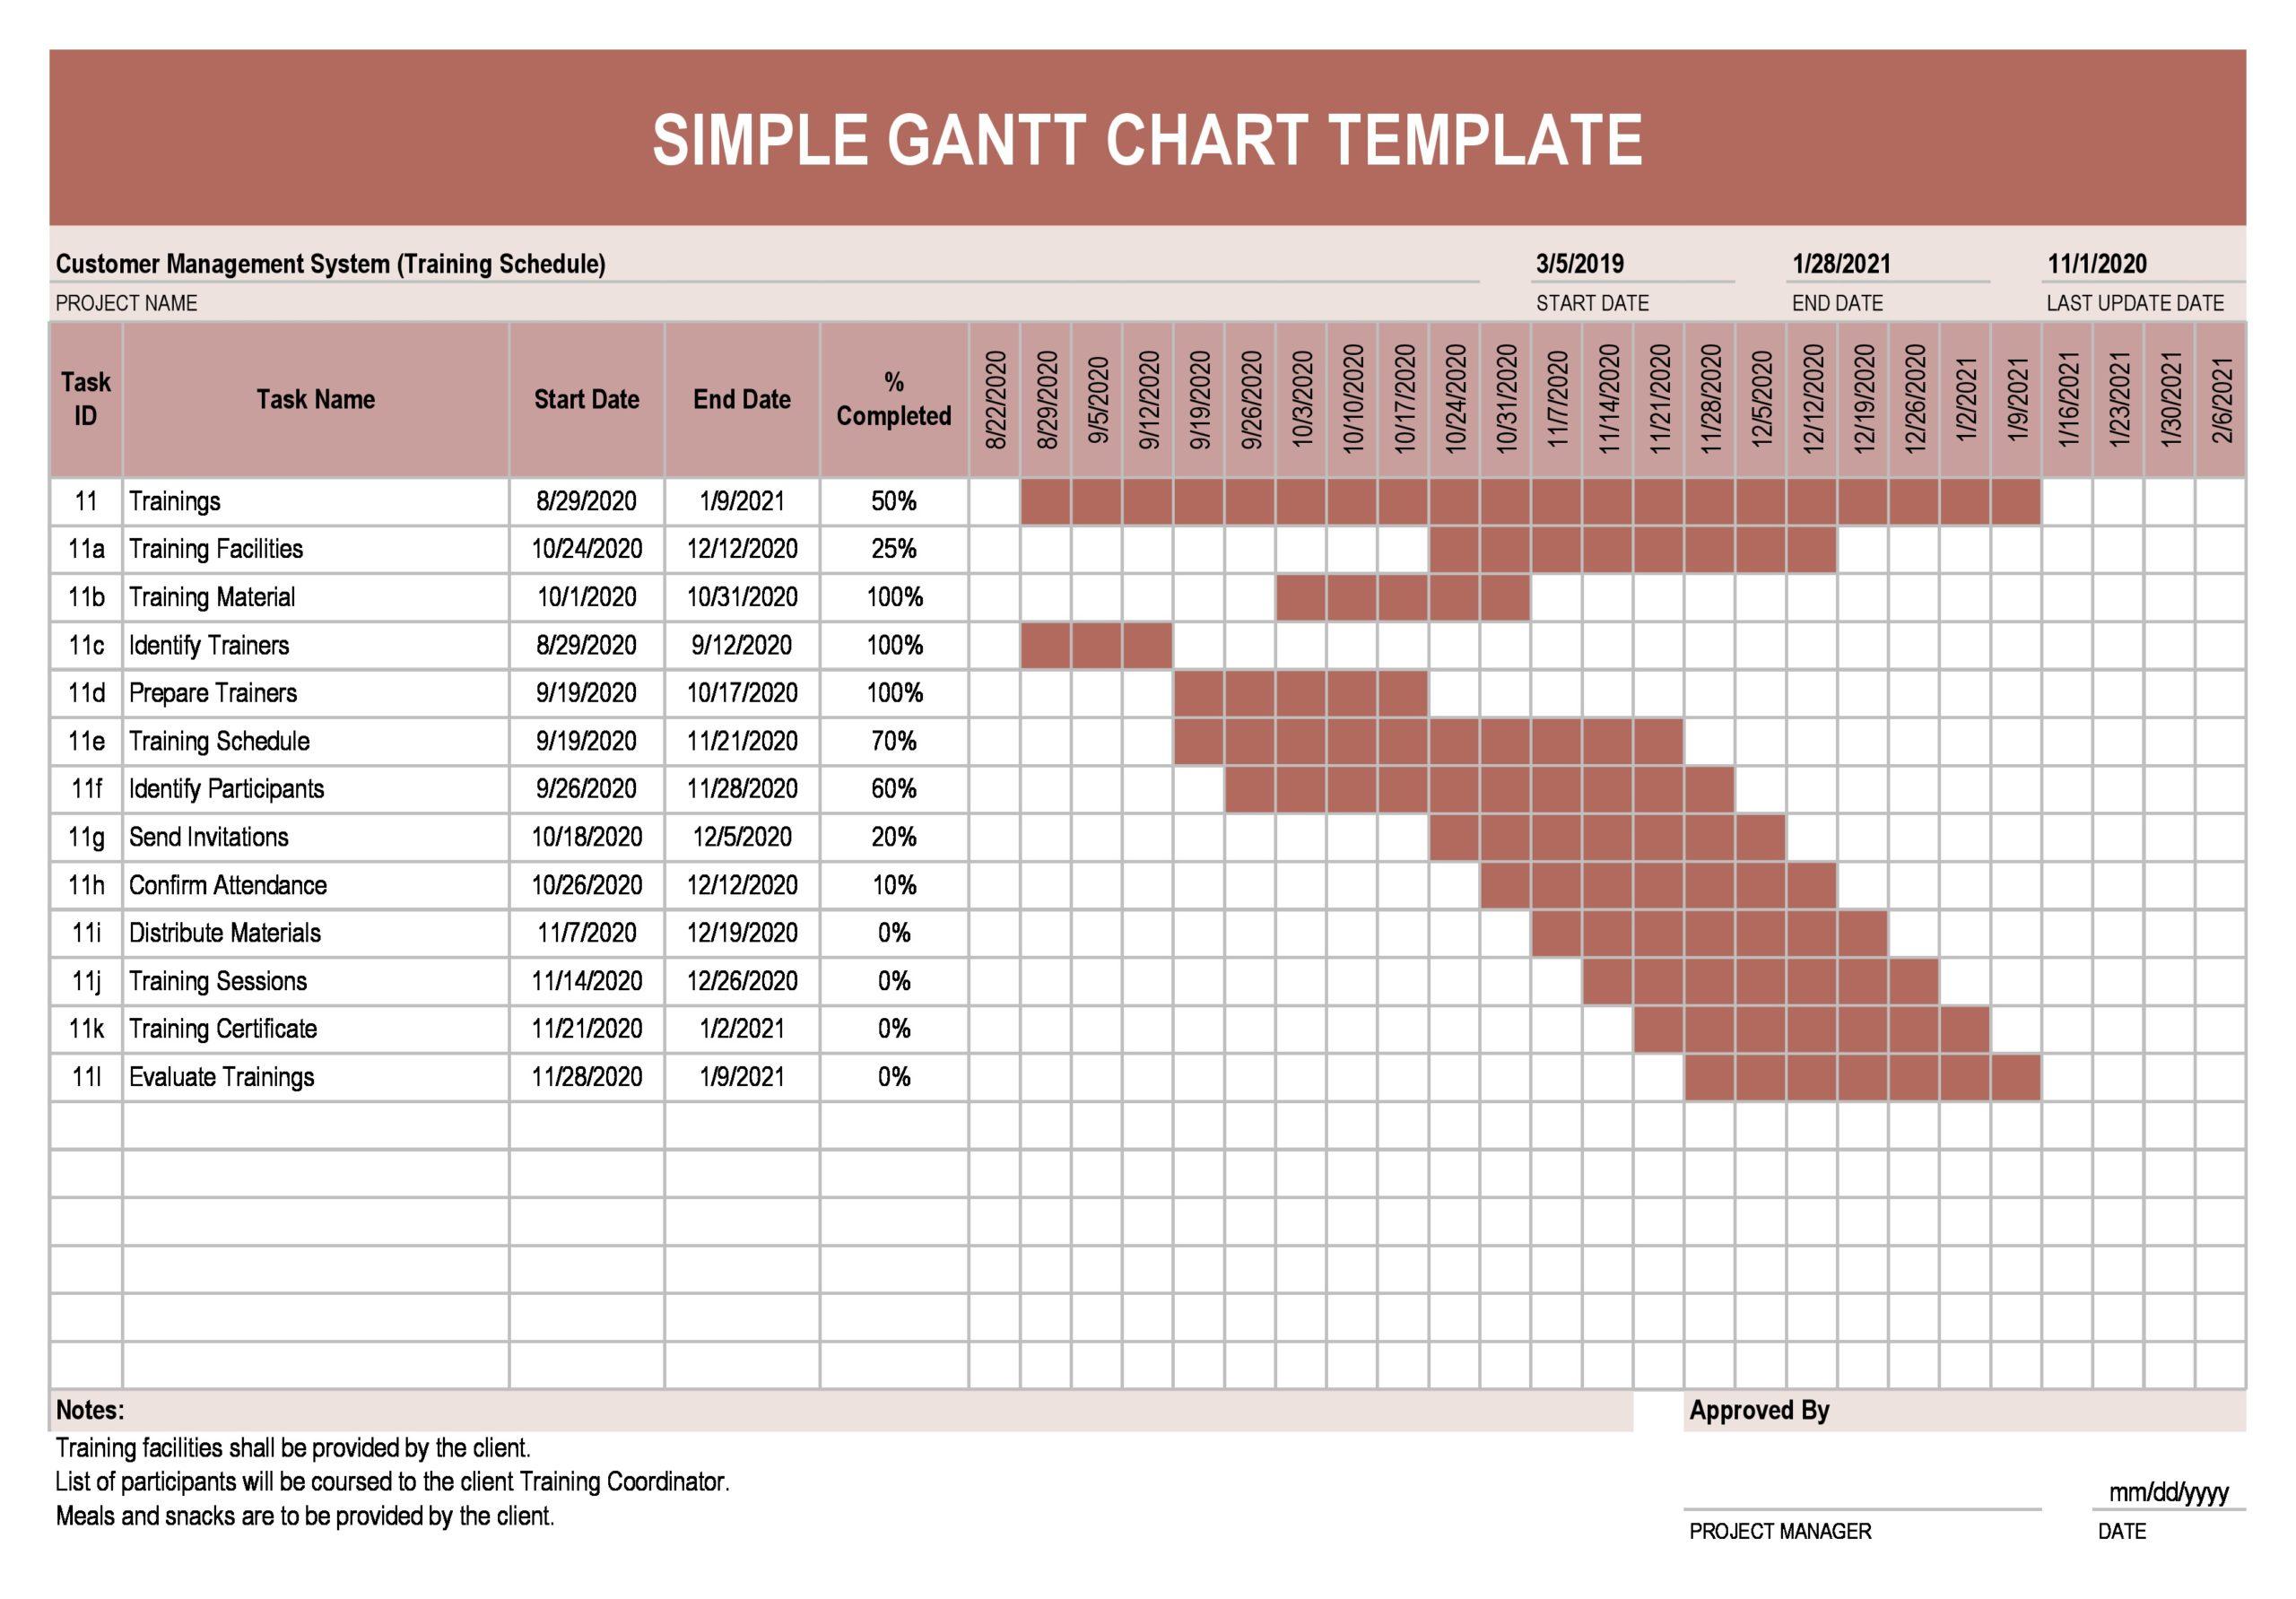 Free Simple Gantt Chart Template - TemplateLab